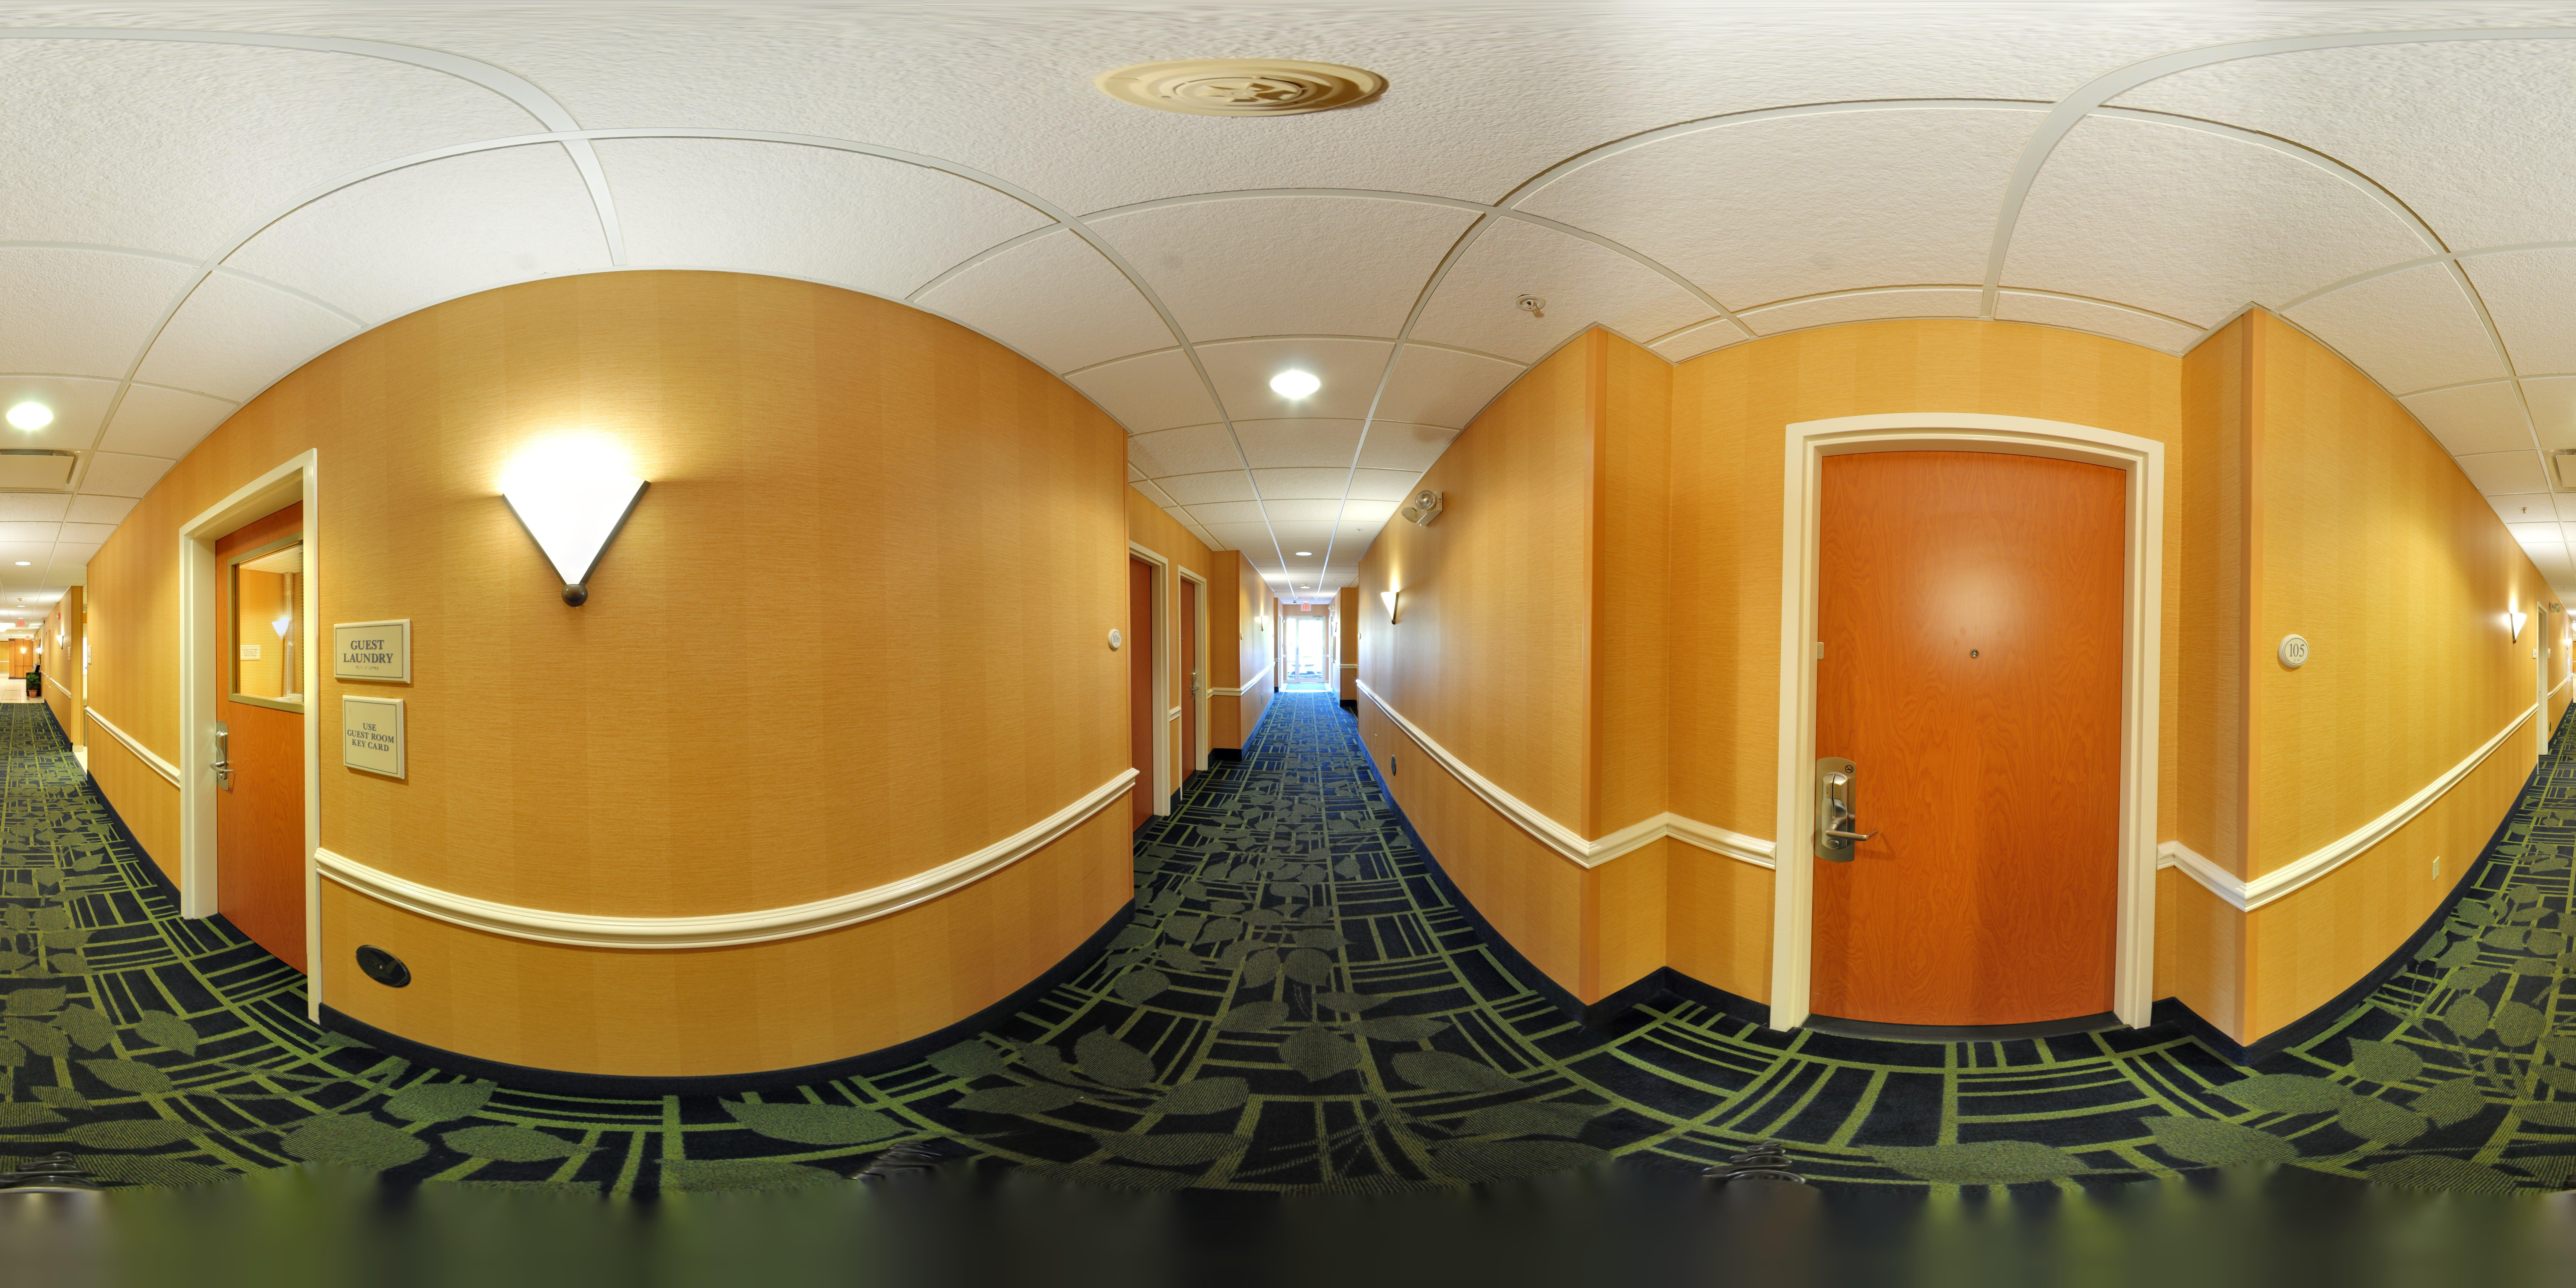 Fairfield Inn & Suites by Marriott Akron South image 26